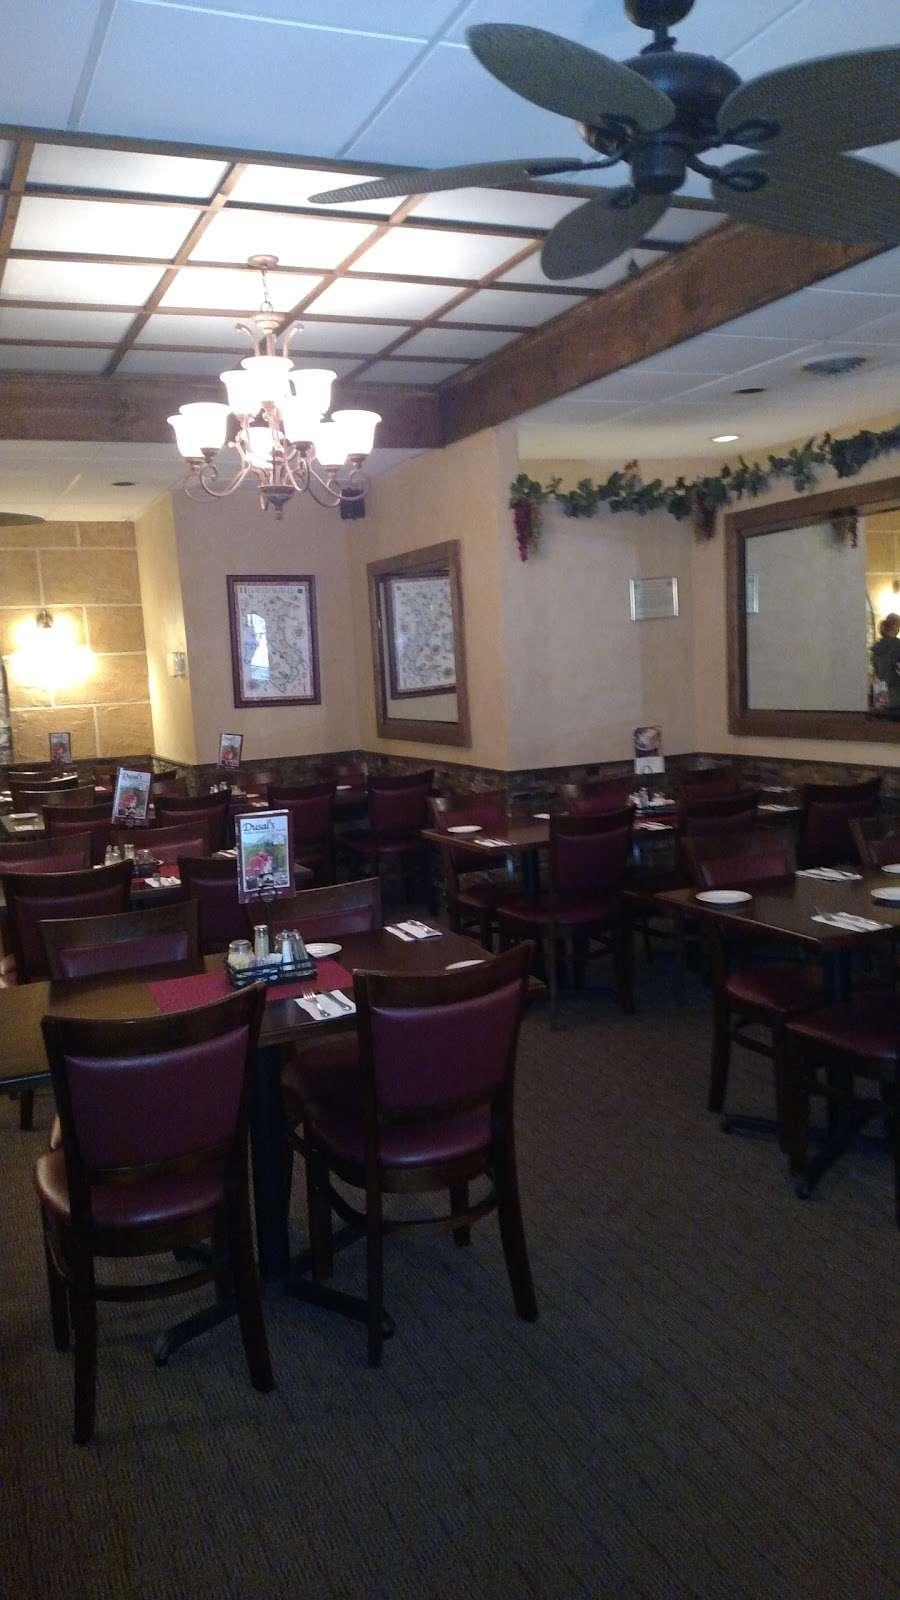 Dusals Pizza - restaurant    Photo 6 of 7   Address: 100 Ryders Ln, Milltown, NJ 08850, USA   Phone: (732) 745-7311